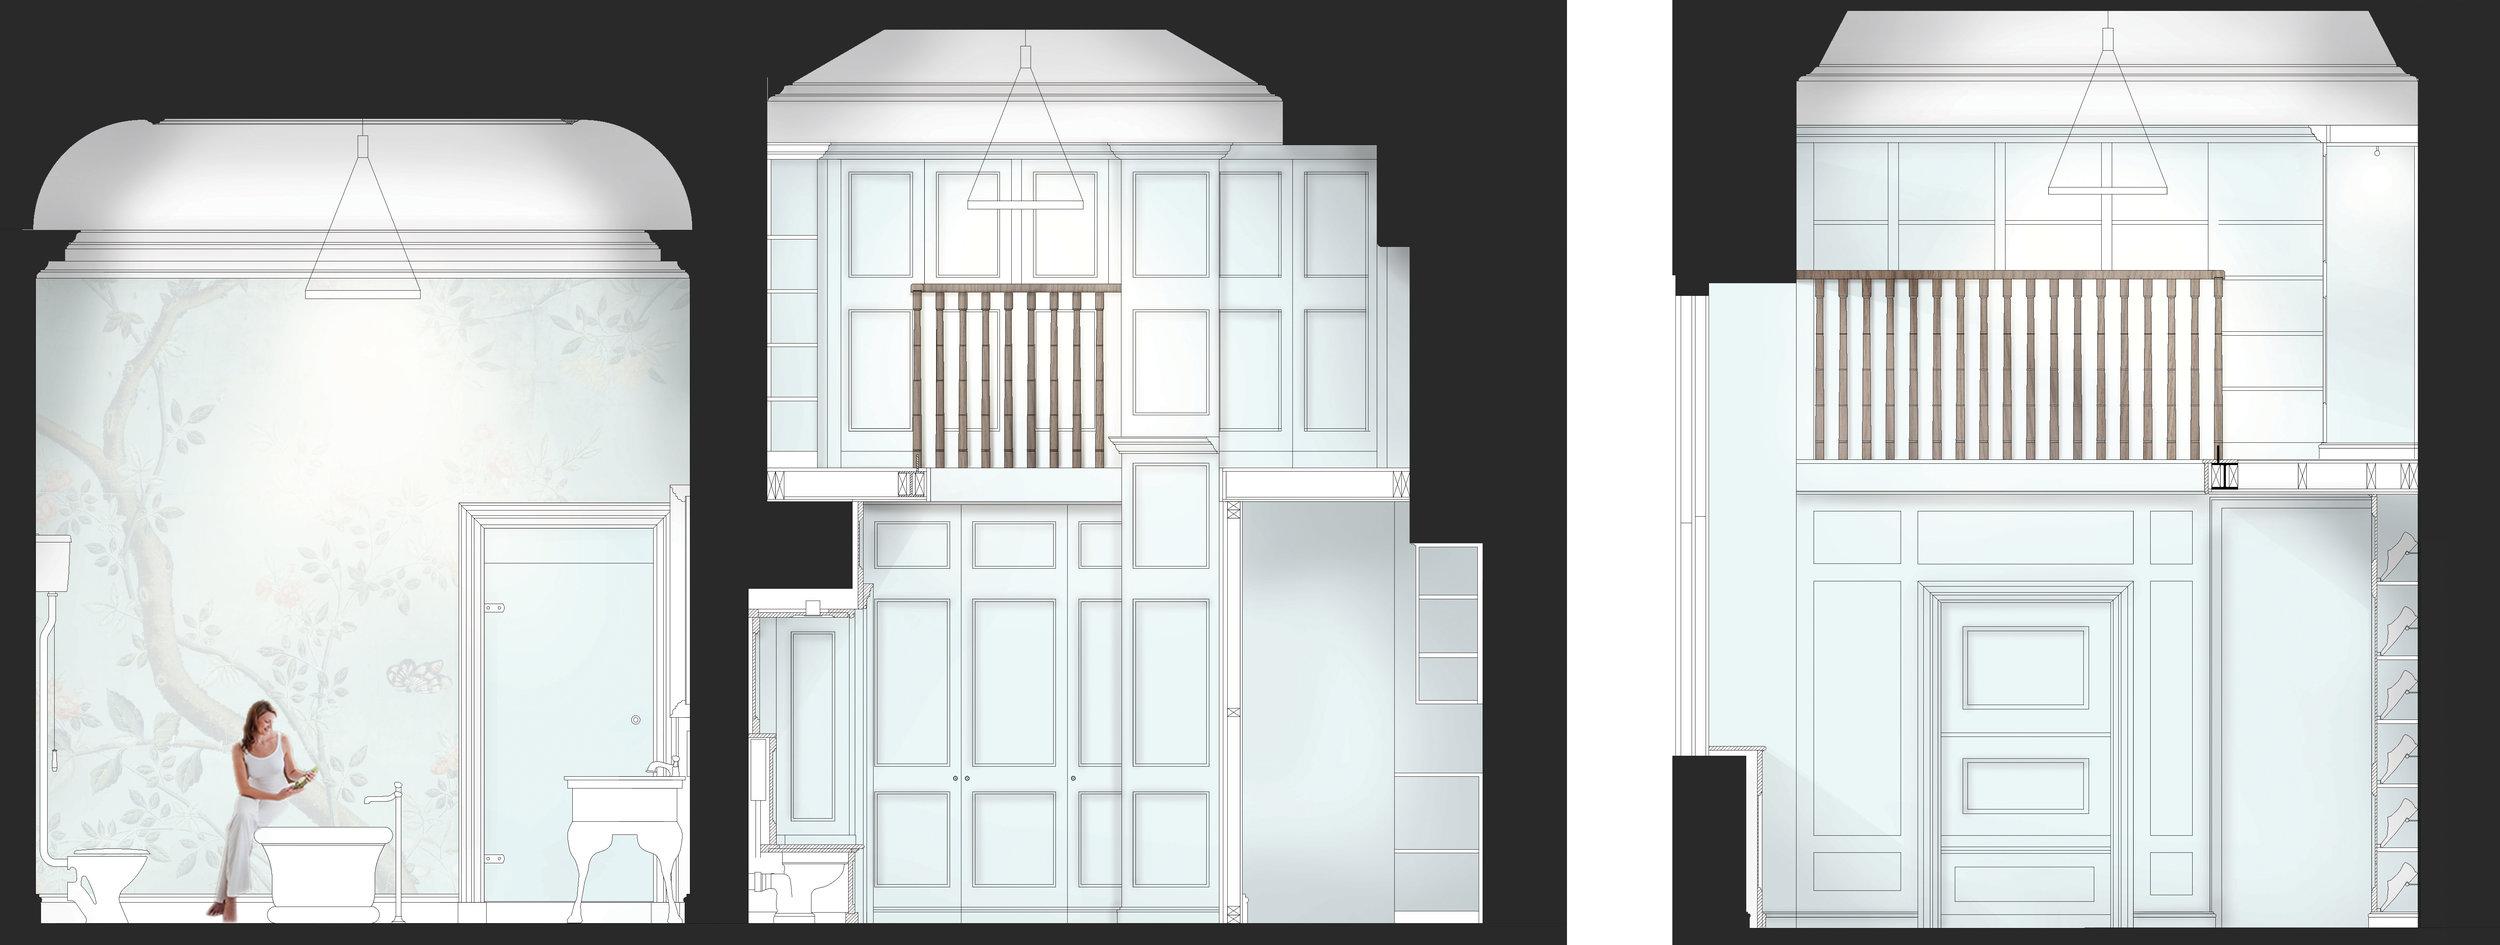 Section C05 (2) merged cropped RGB.jpg